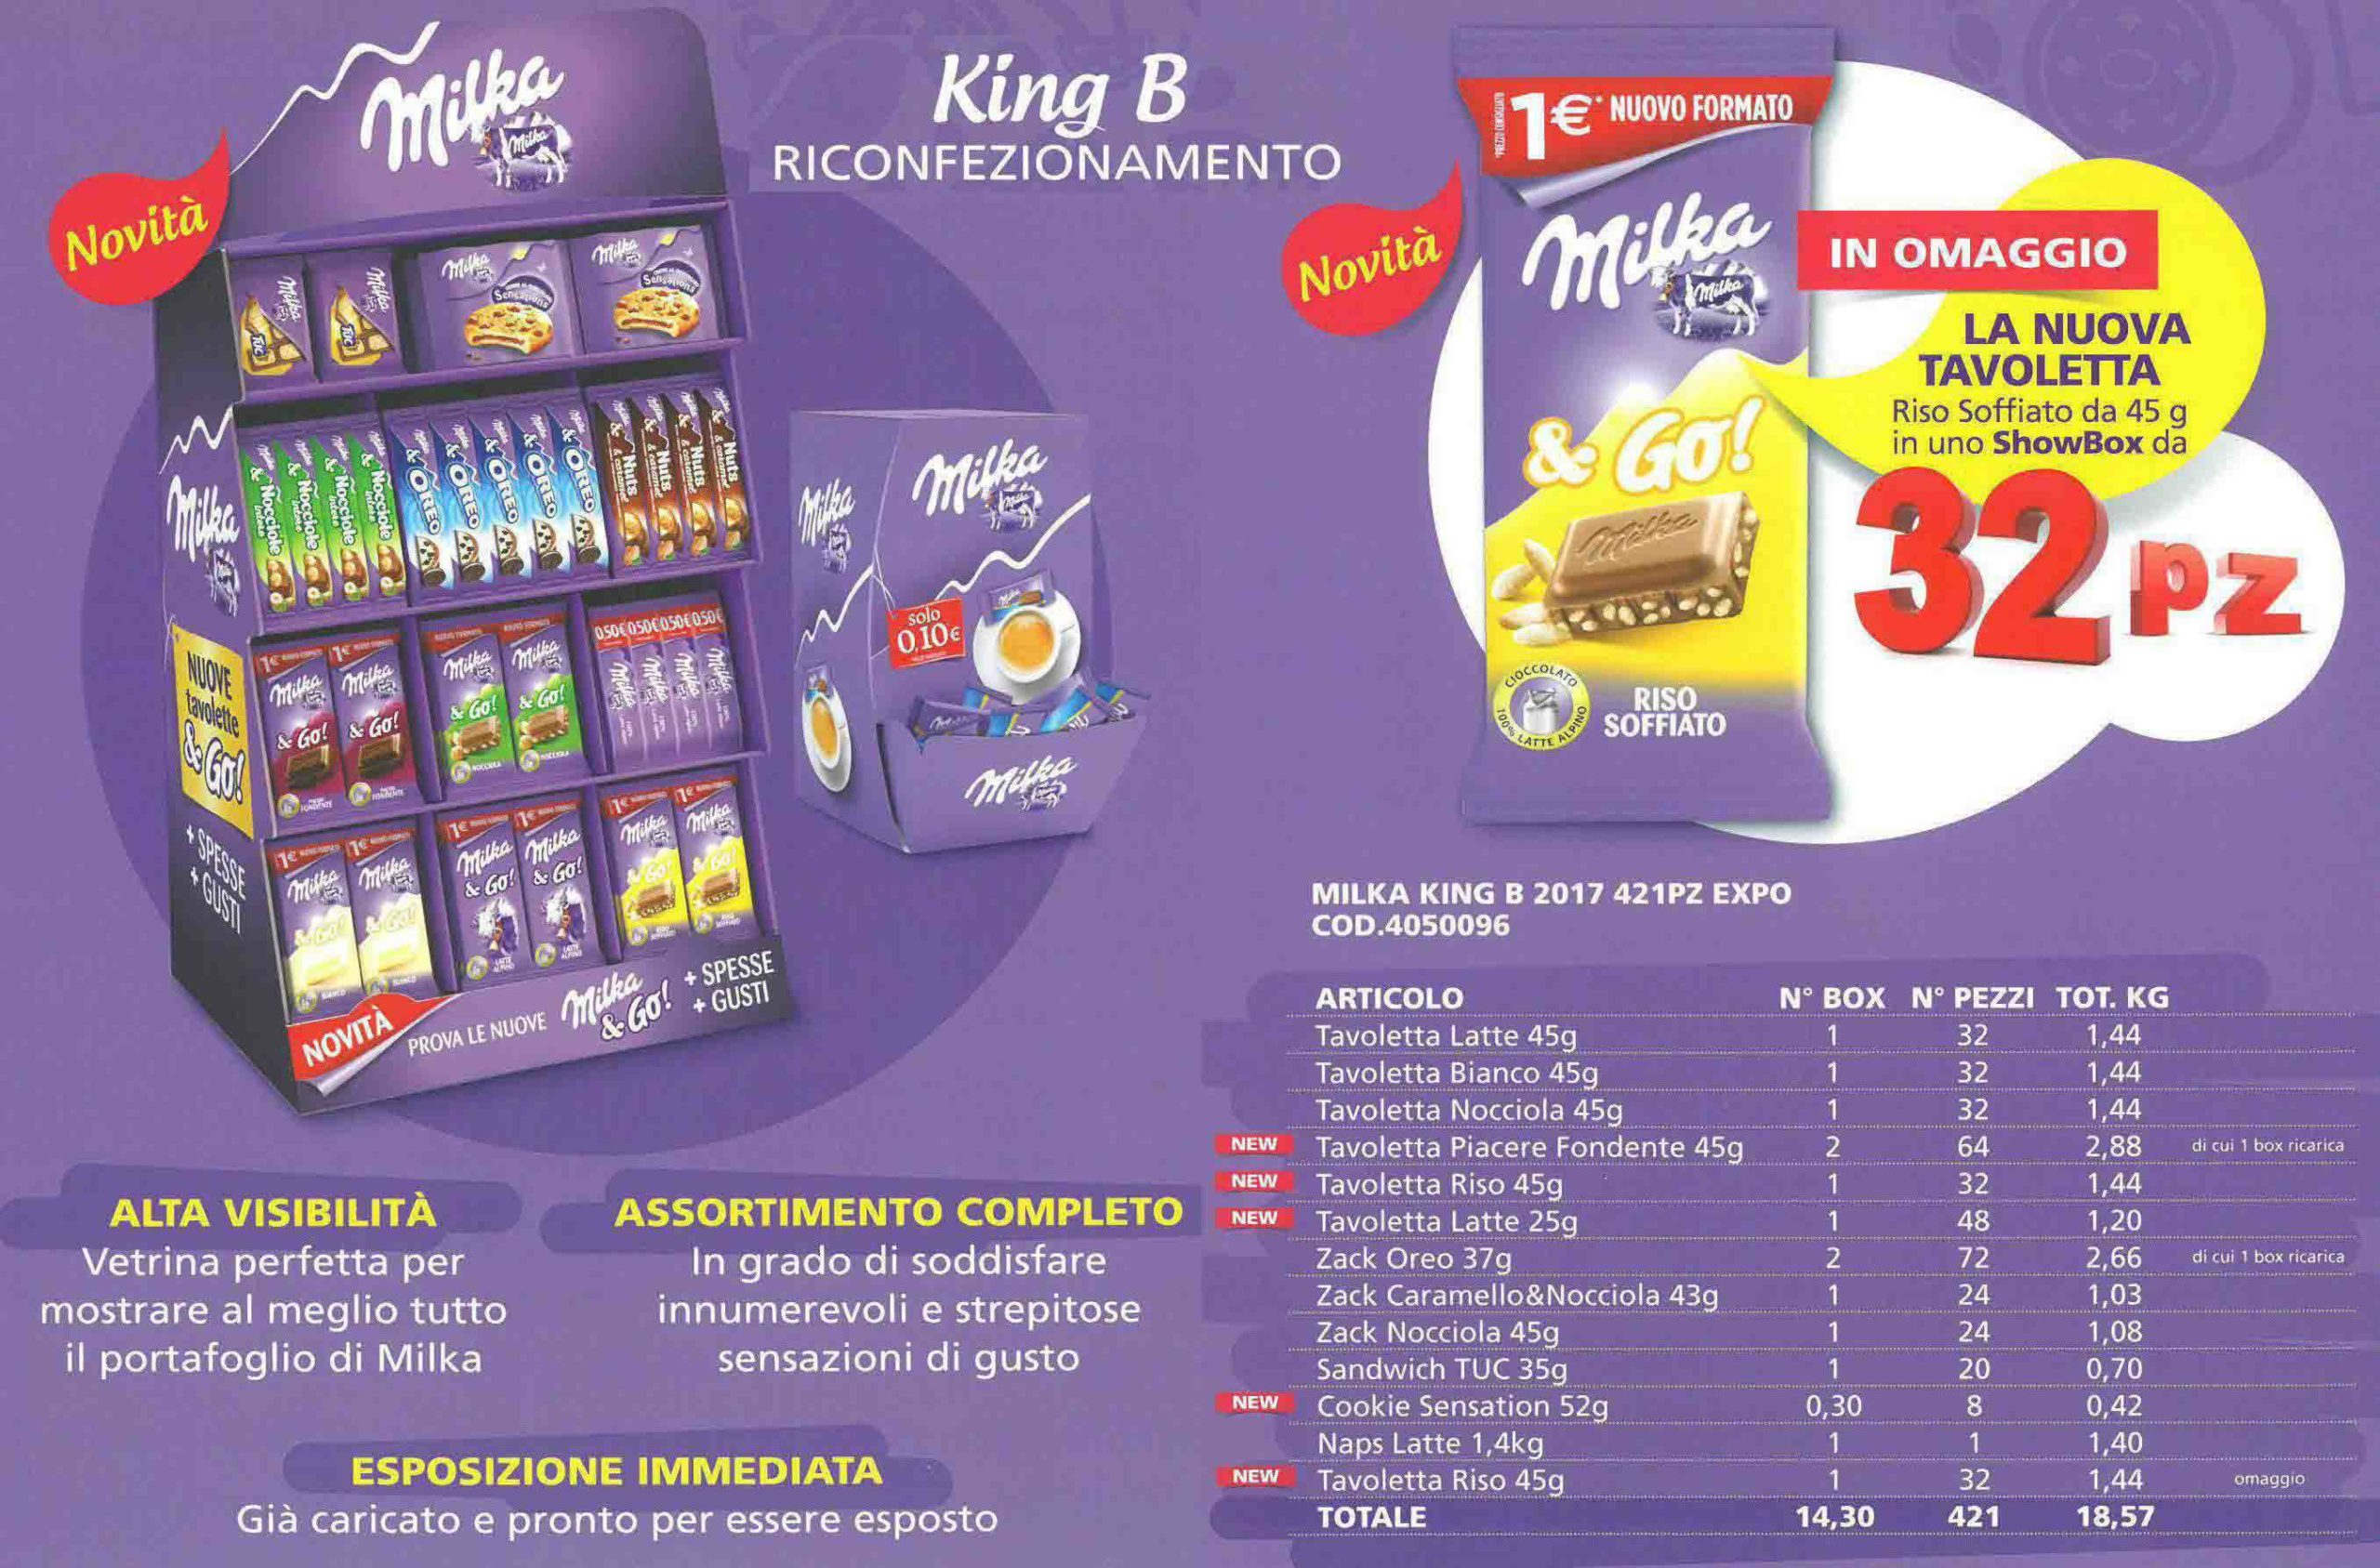 cartone-misto-milka-king-b-421pz-expo-da-banco